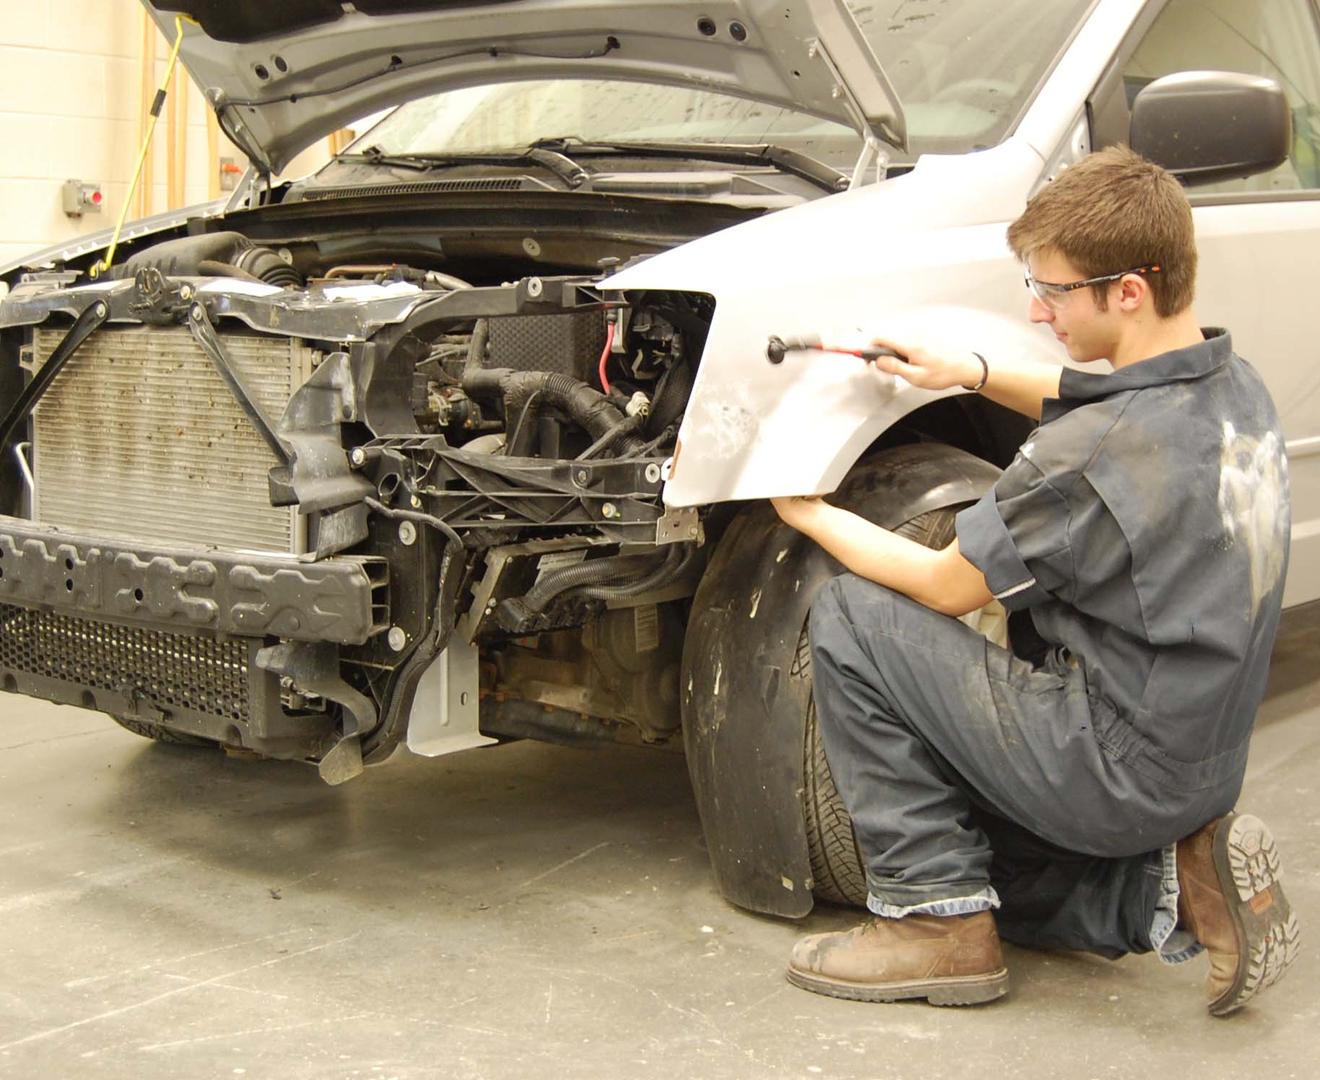 Collision Repair Shops Near Me >> Mesquite Collision Center Auto Body Repair Auto Collision Repair